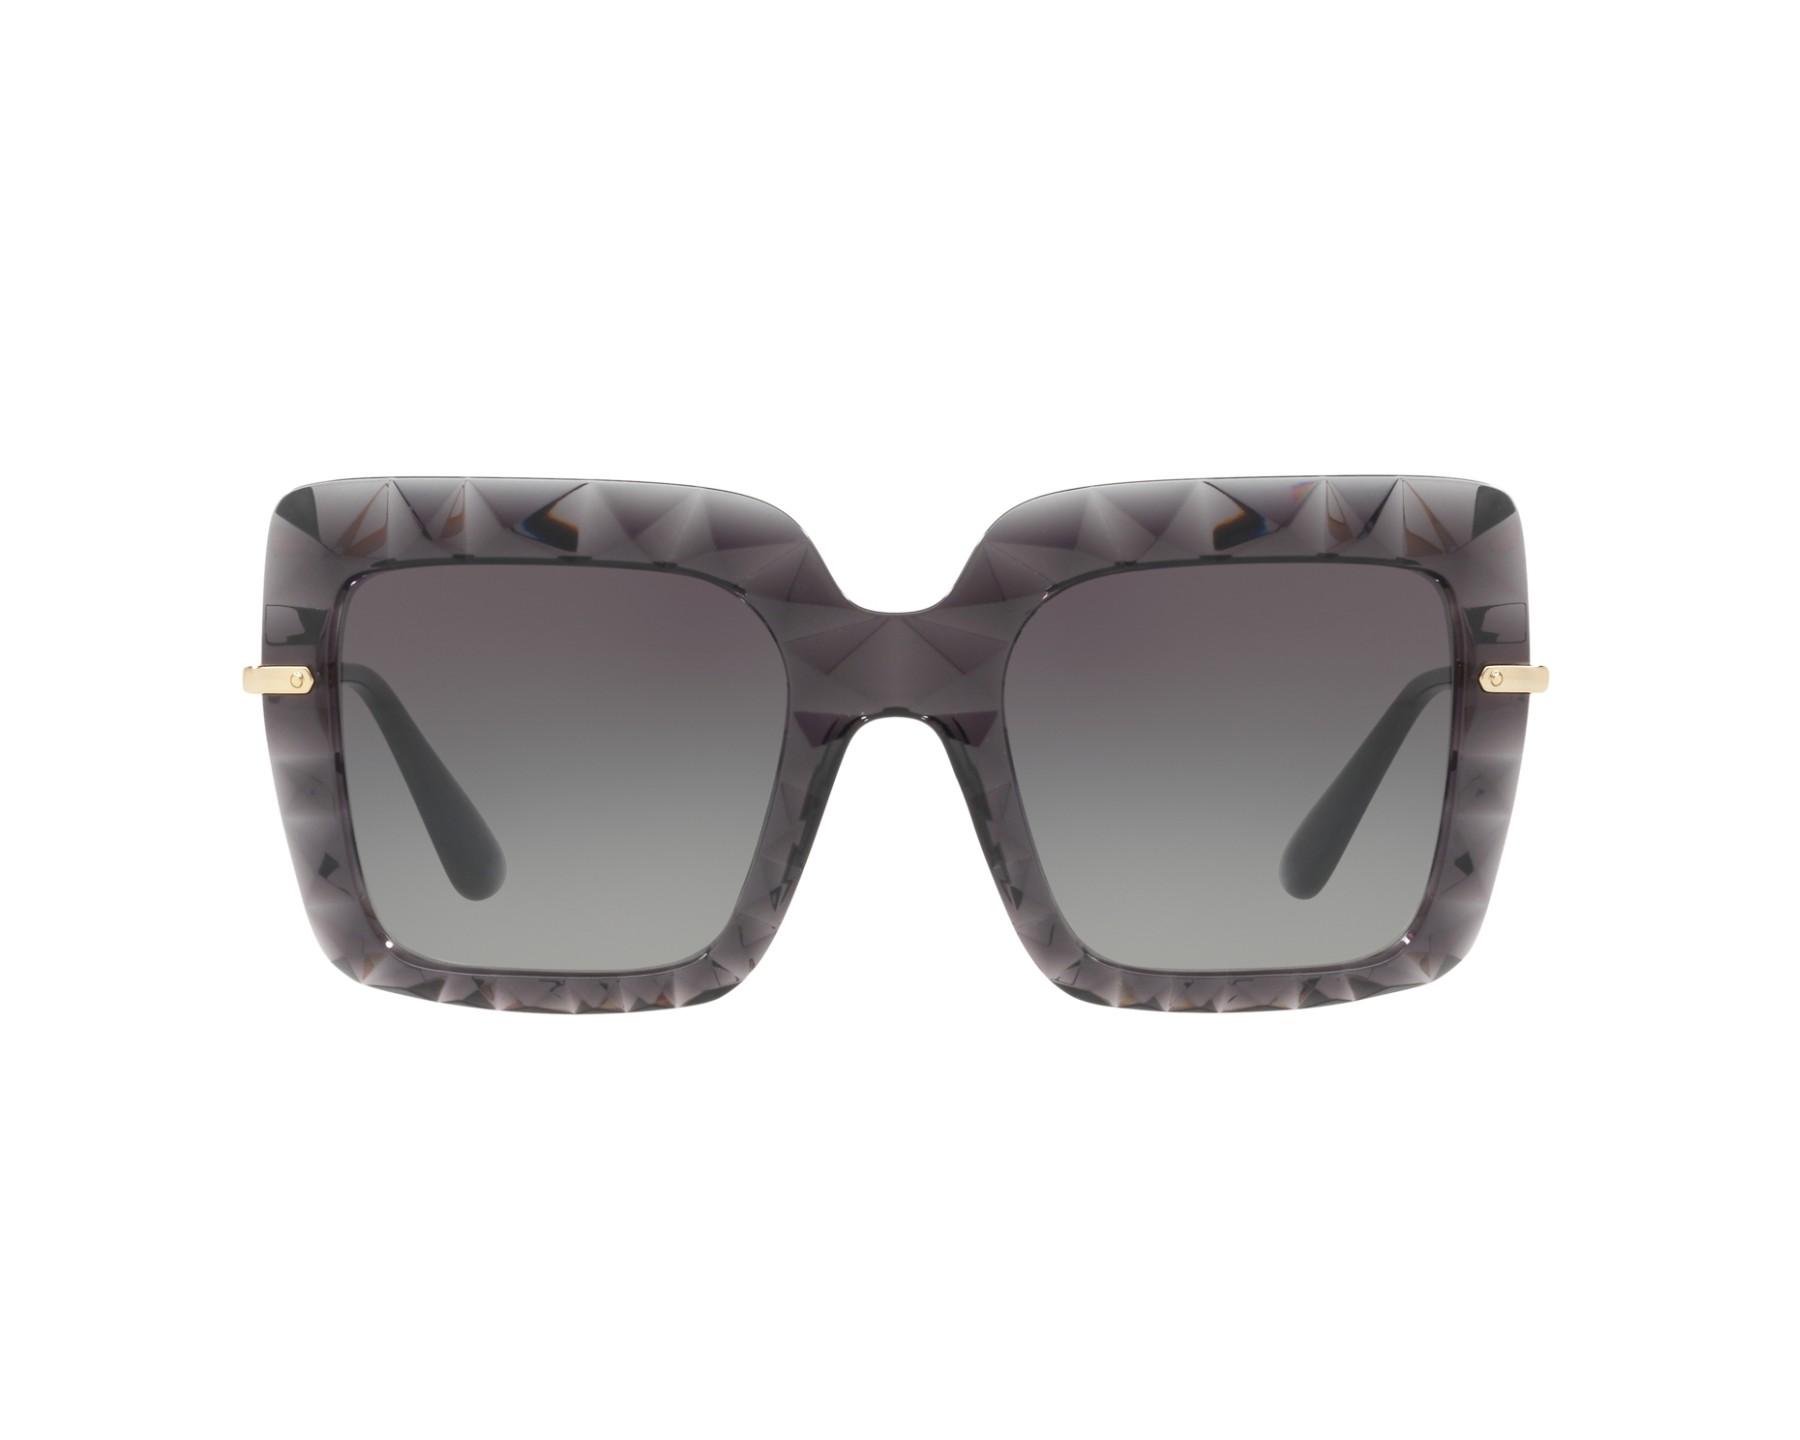 Dolce & Gabbana Frame GREY WITH - MPodpQ7A